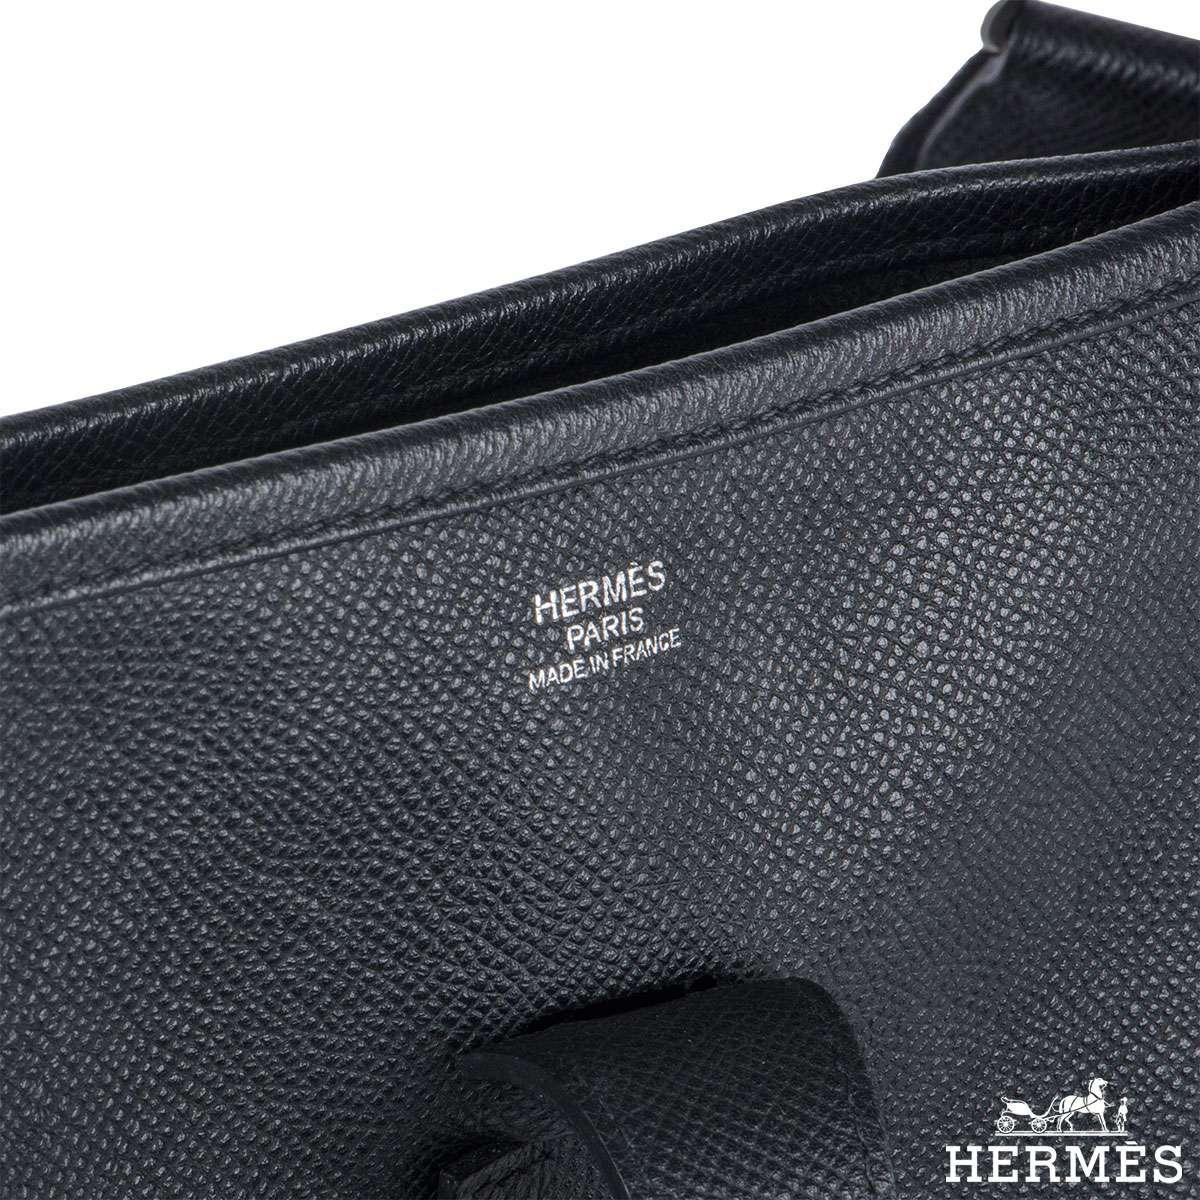 Hermes Evelyne III GM Handbag